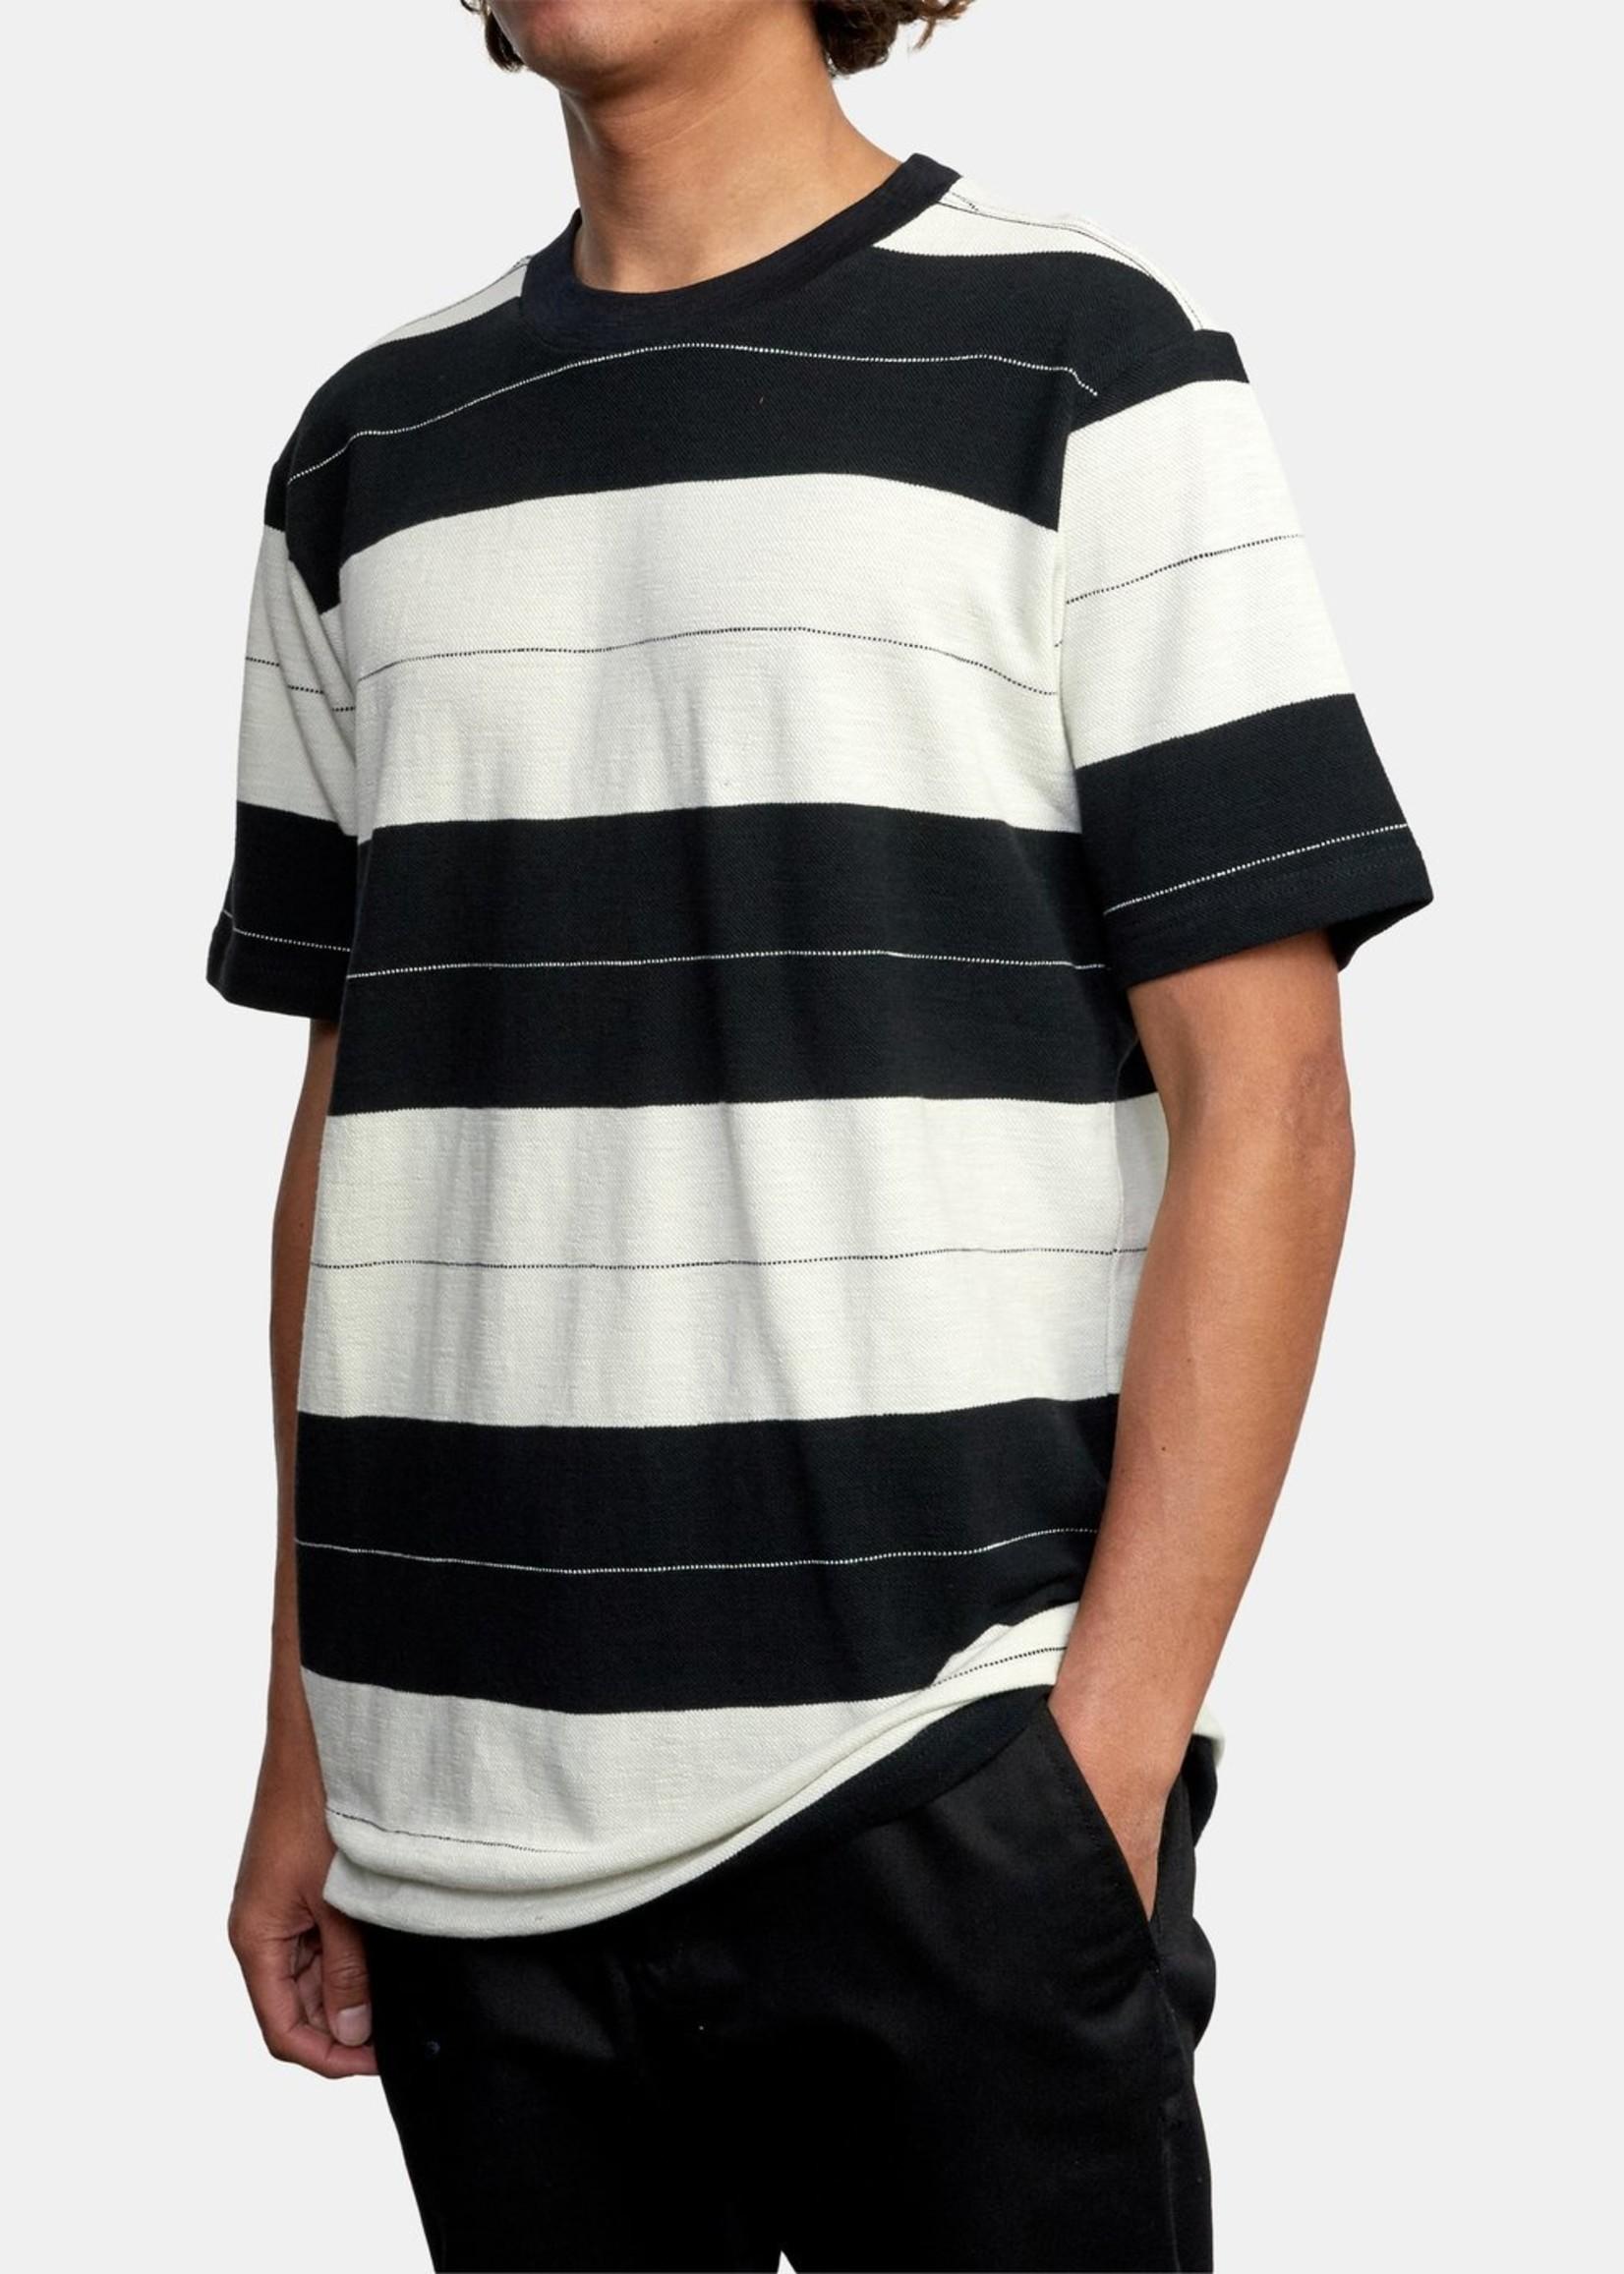 RVCA Rumble Knit Shirt